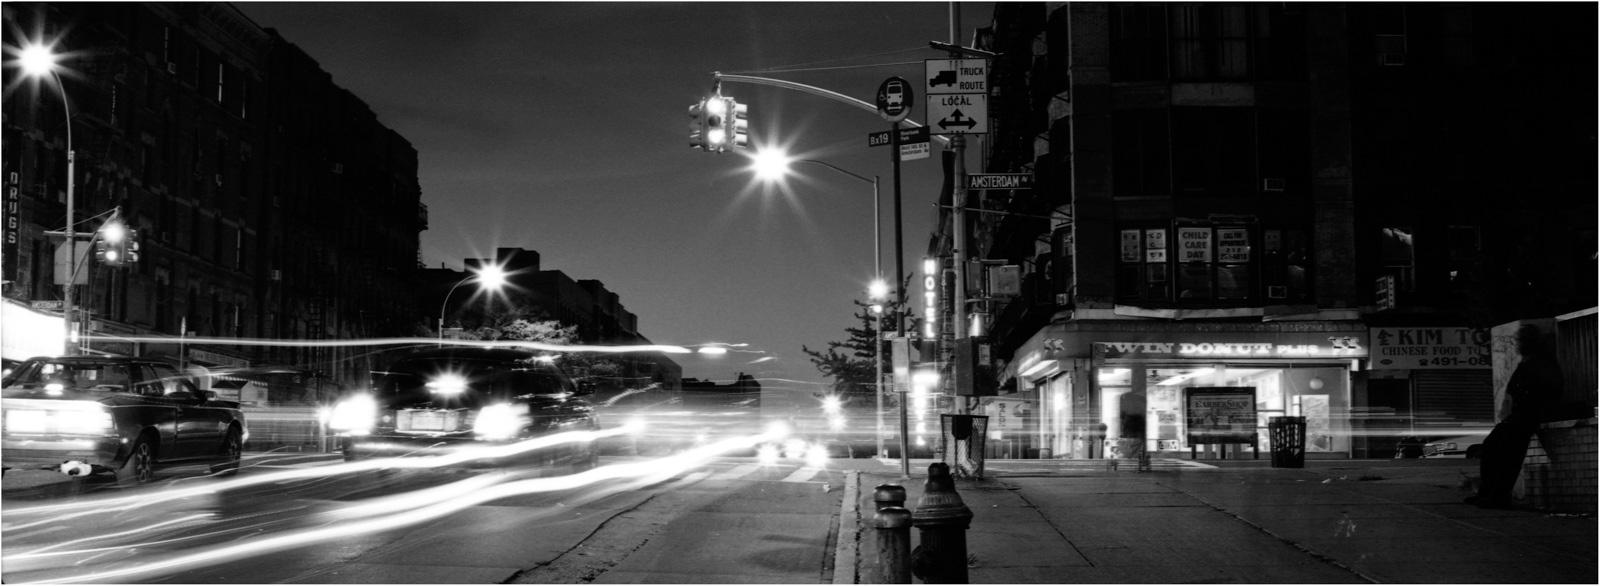 Art and Documentary Photography - Loading 020830101.jpg